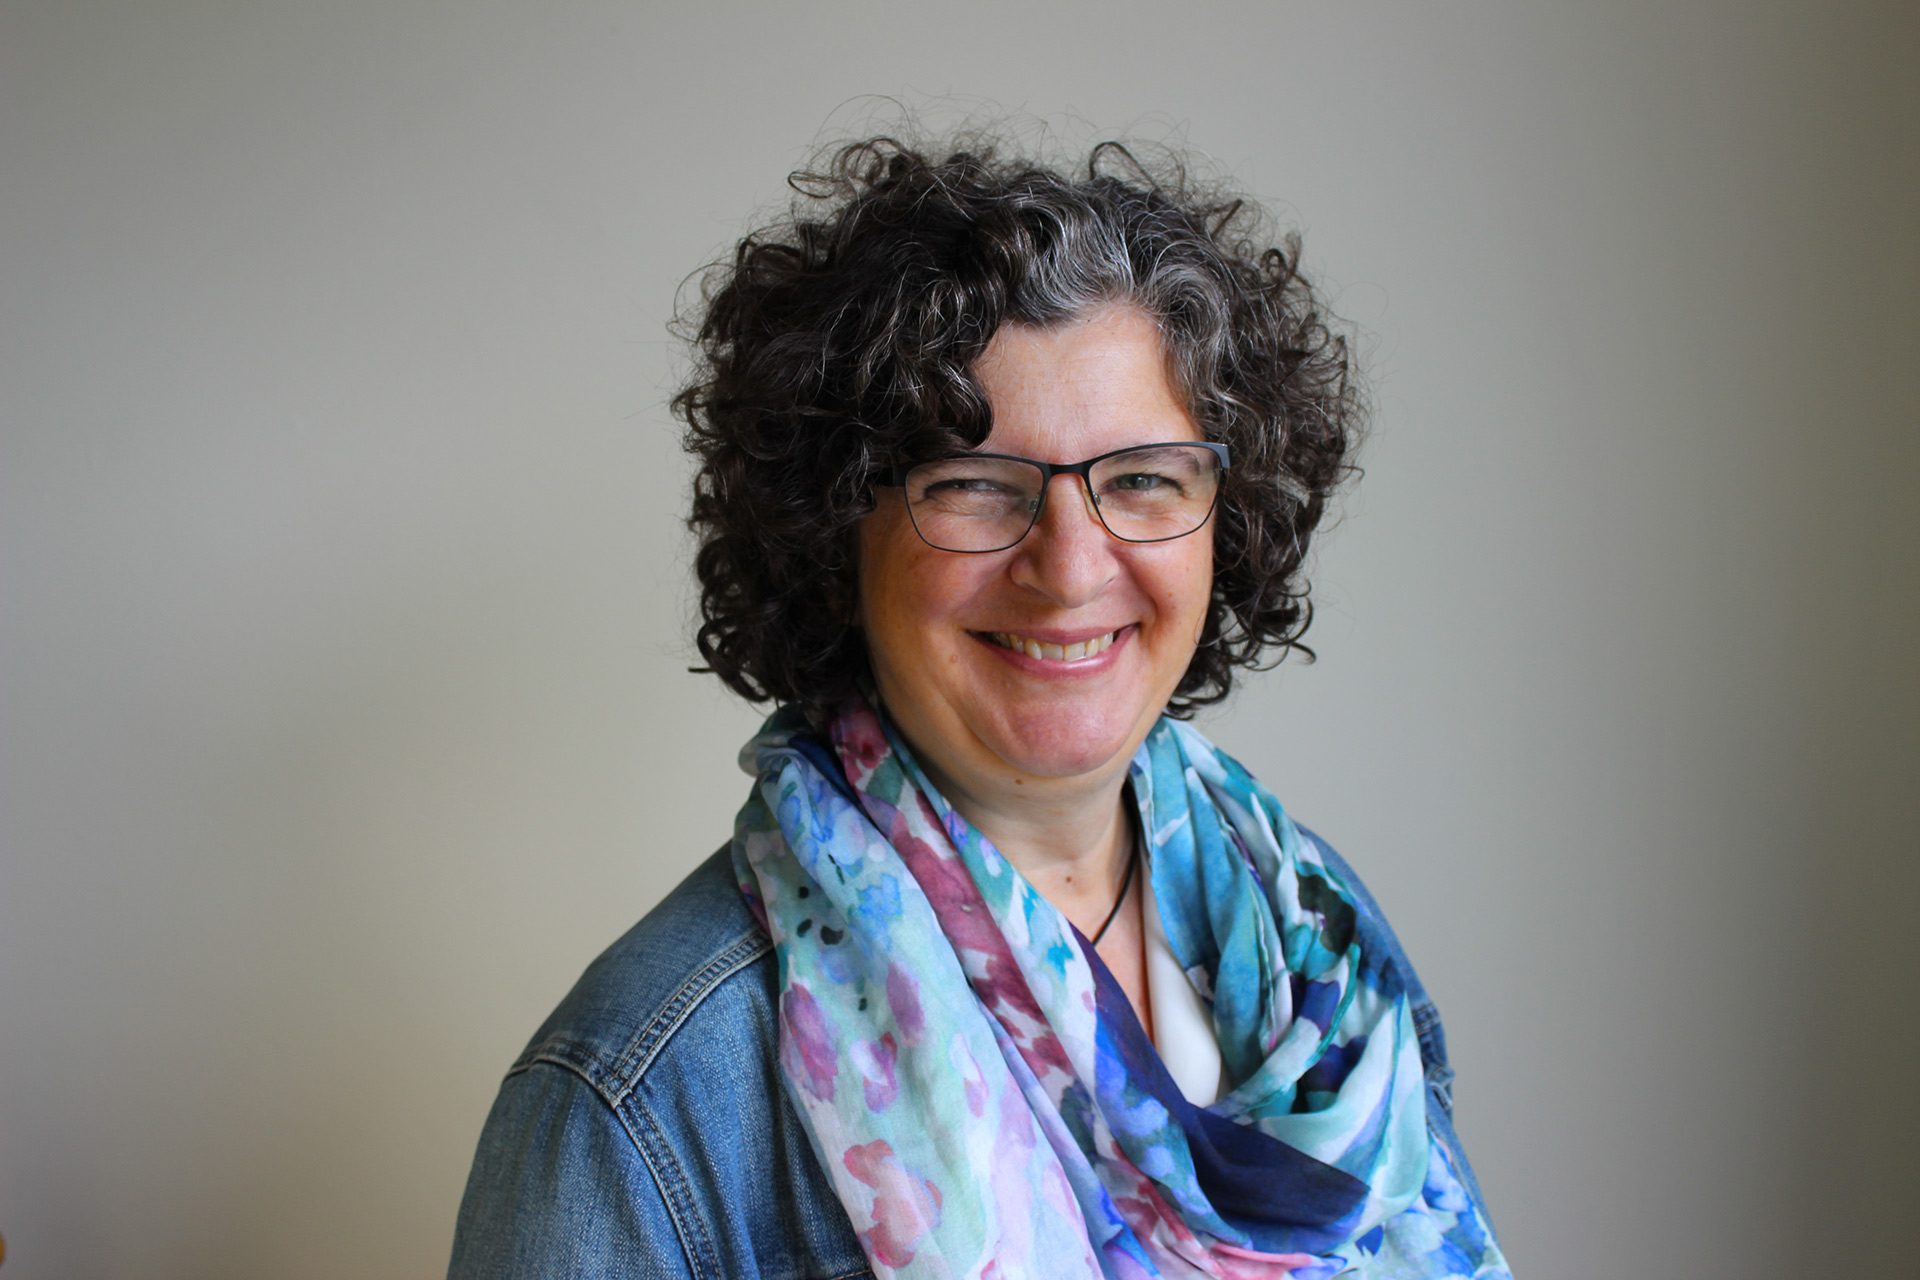 Annette Donovan Panchaud